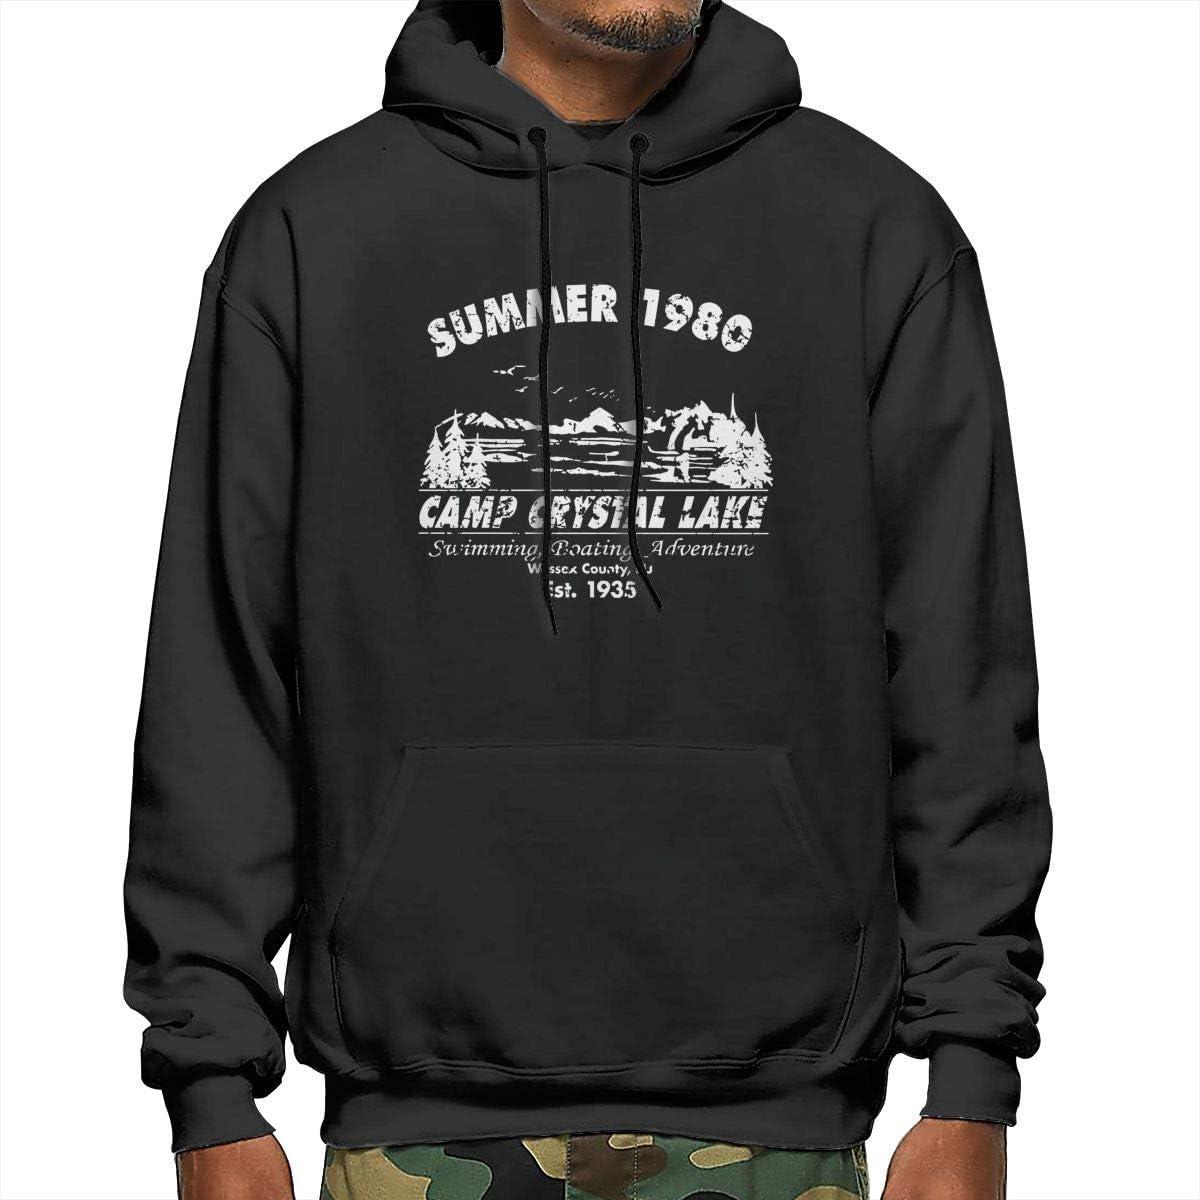 Sanda Suer 1980 Mens Hooded Sweatshirt